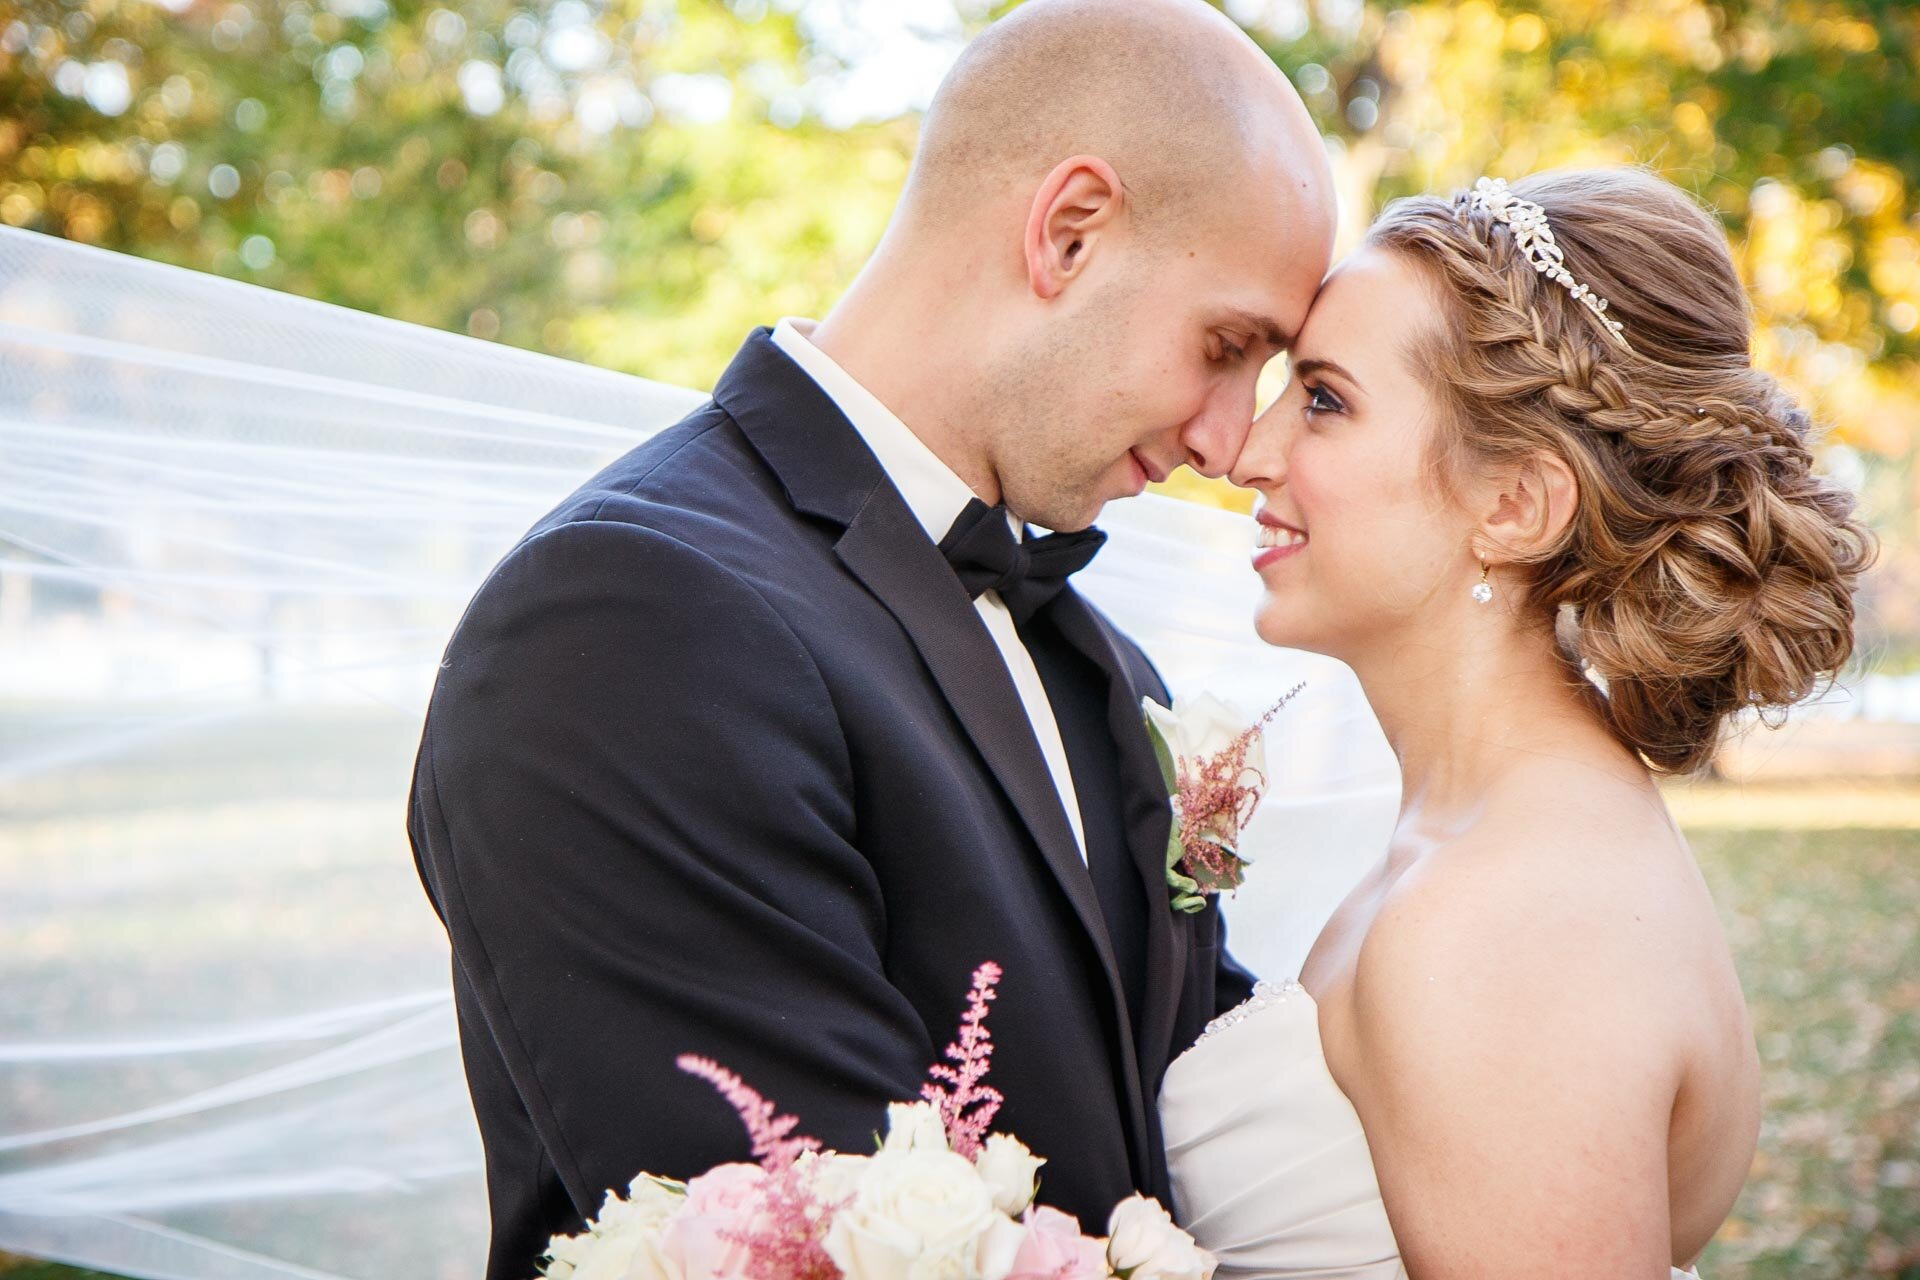 adam-shea-photography-fall-autumn-lighting-engagement-wedding-photos-adam-shea-photography-green-bay-appleton-neenah-photographer-09.jpg